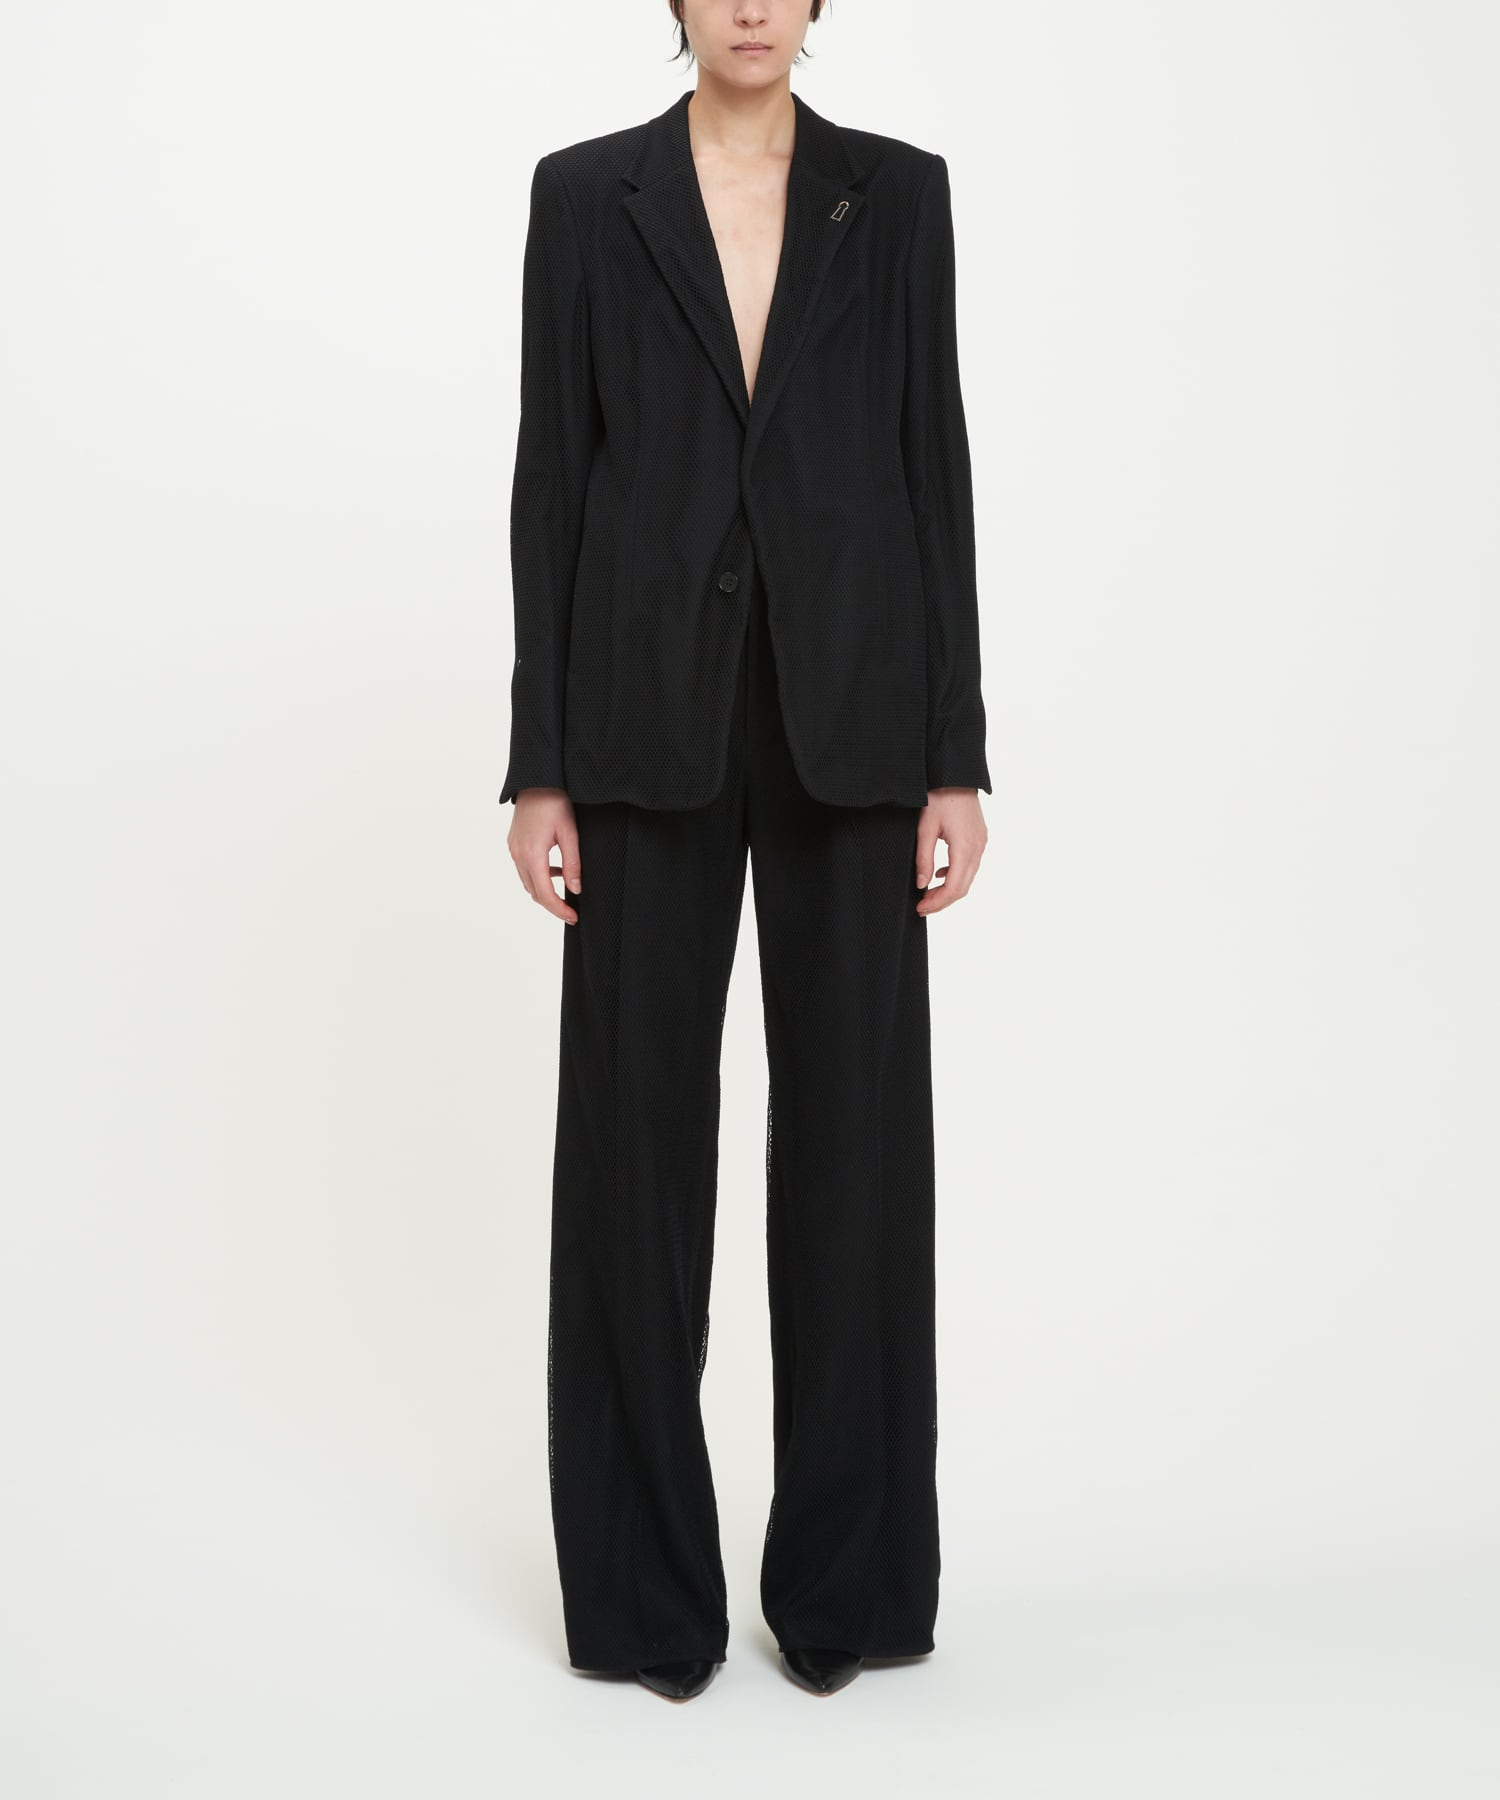 Black Tights Covering Minimalist Blazer